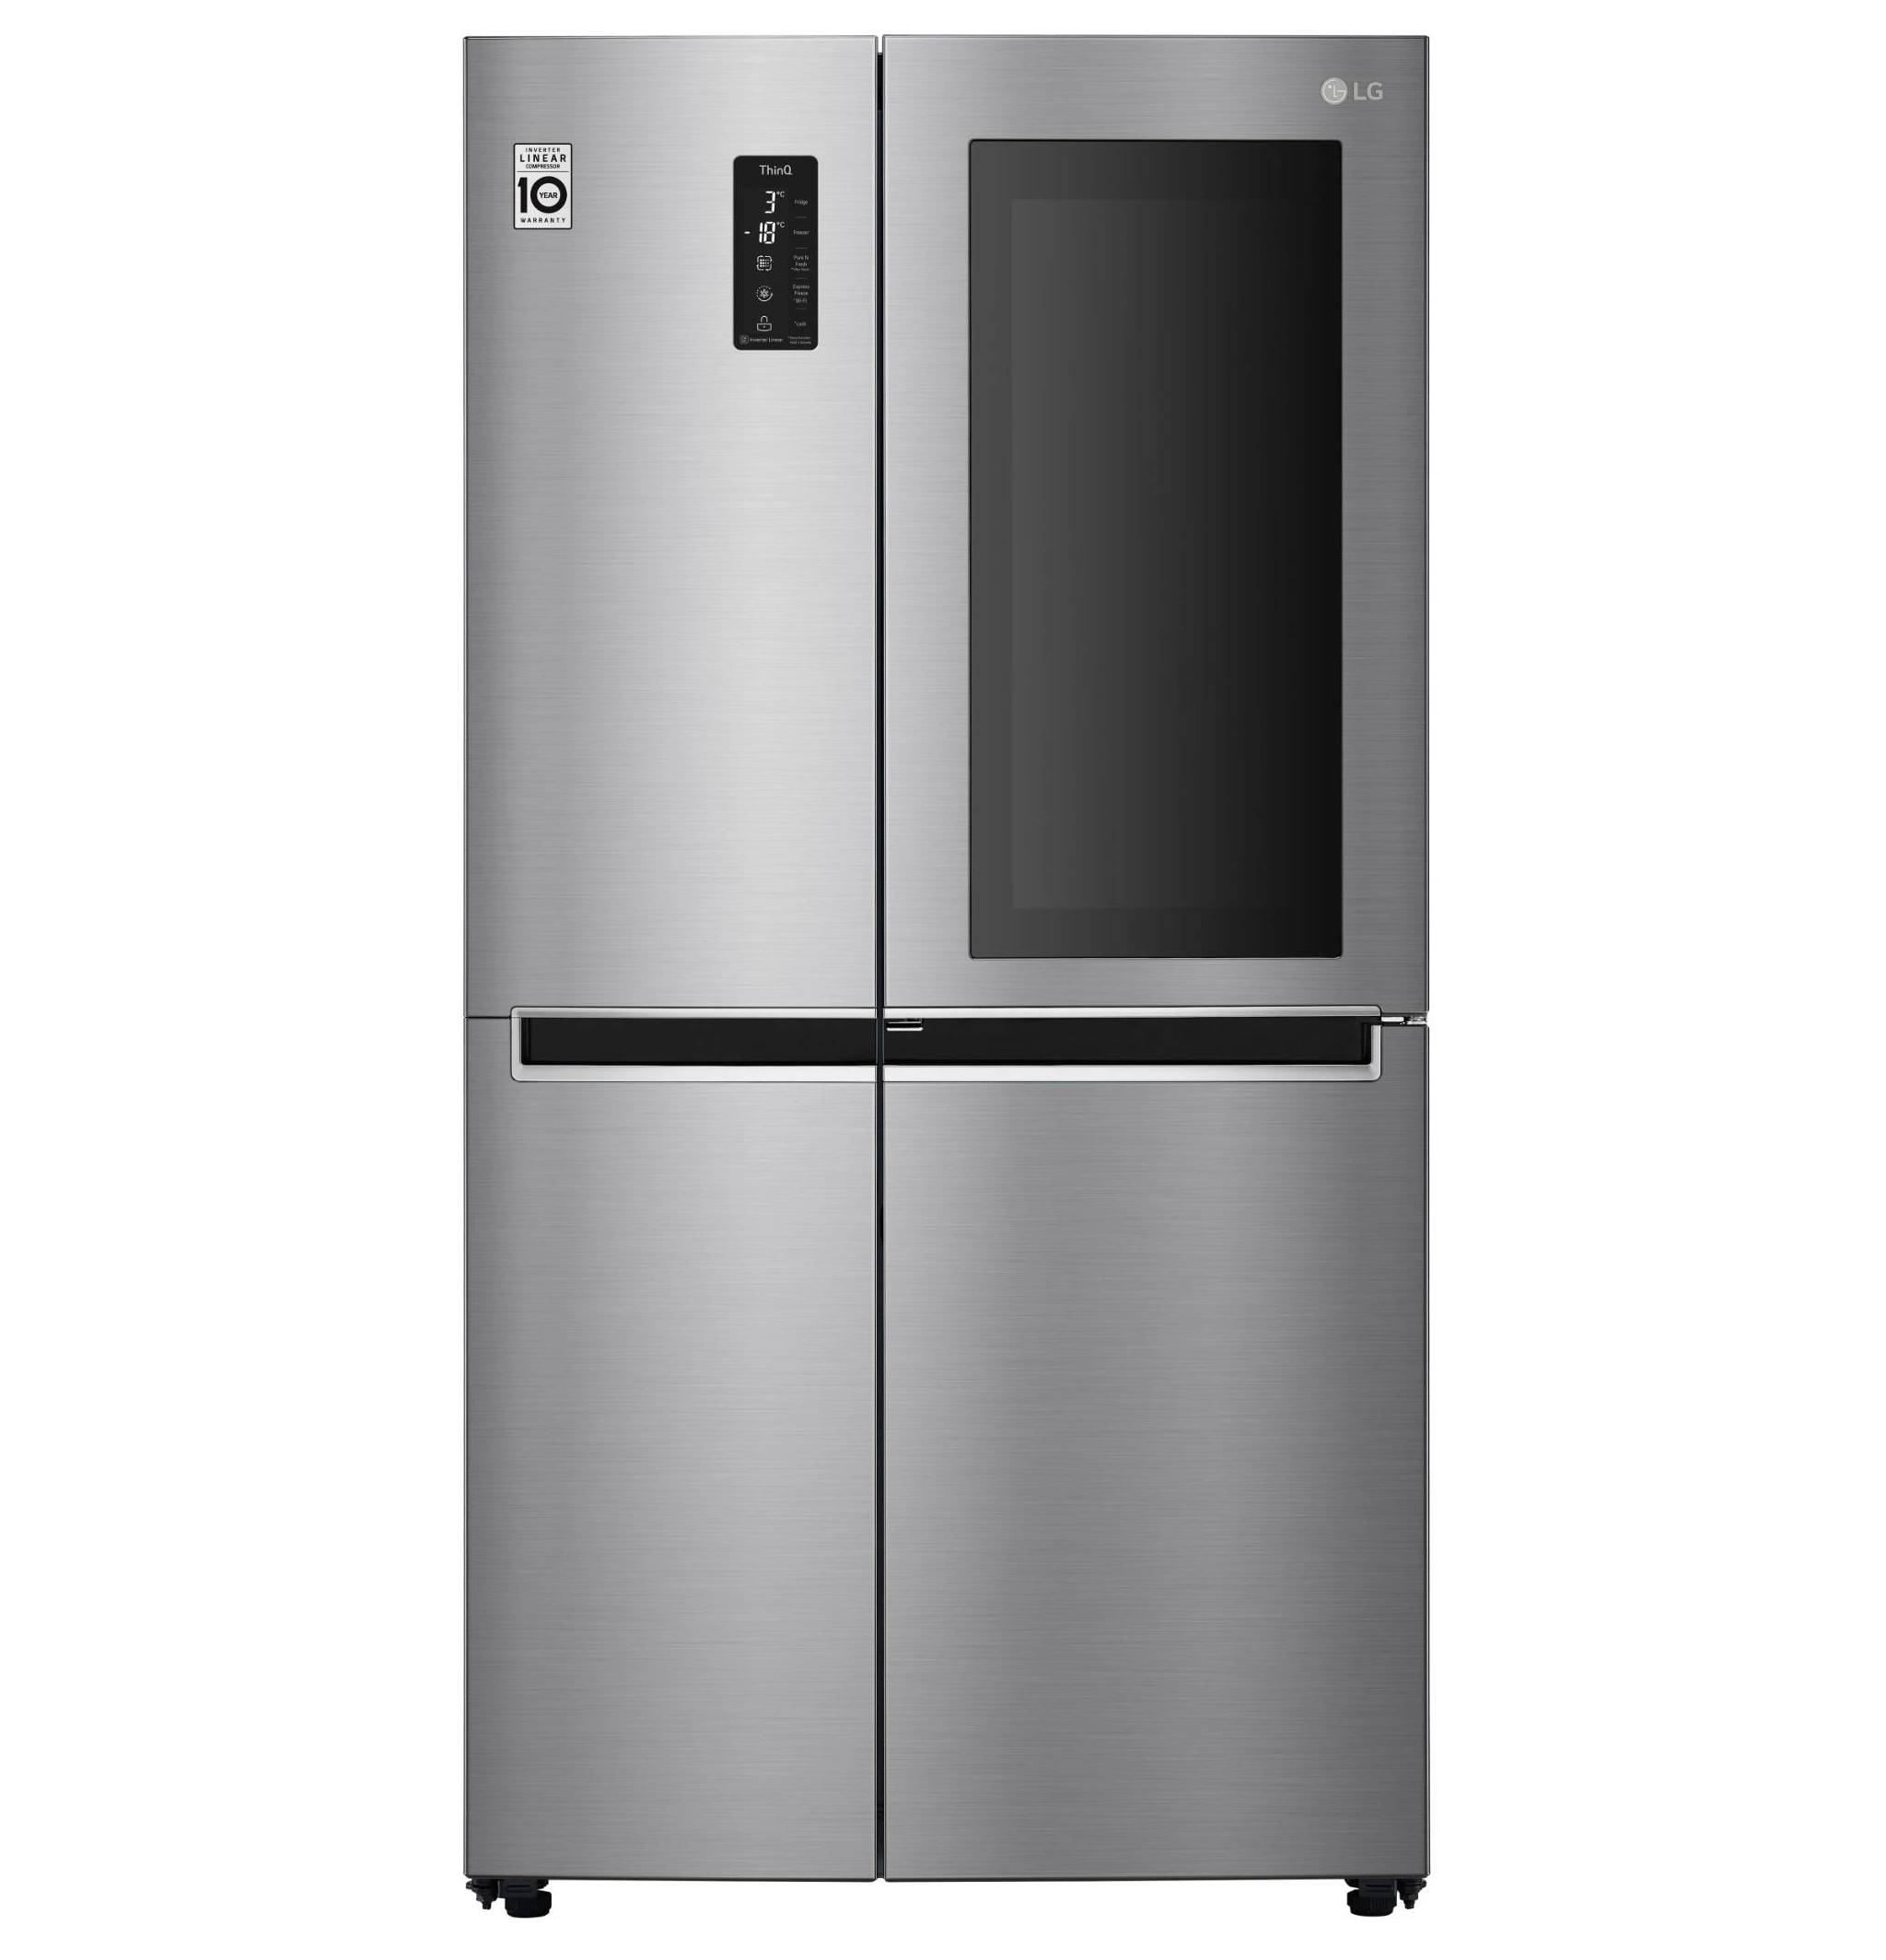 LG GS-VB680PL Refrigerator